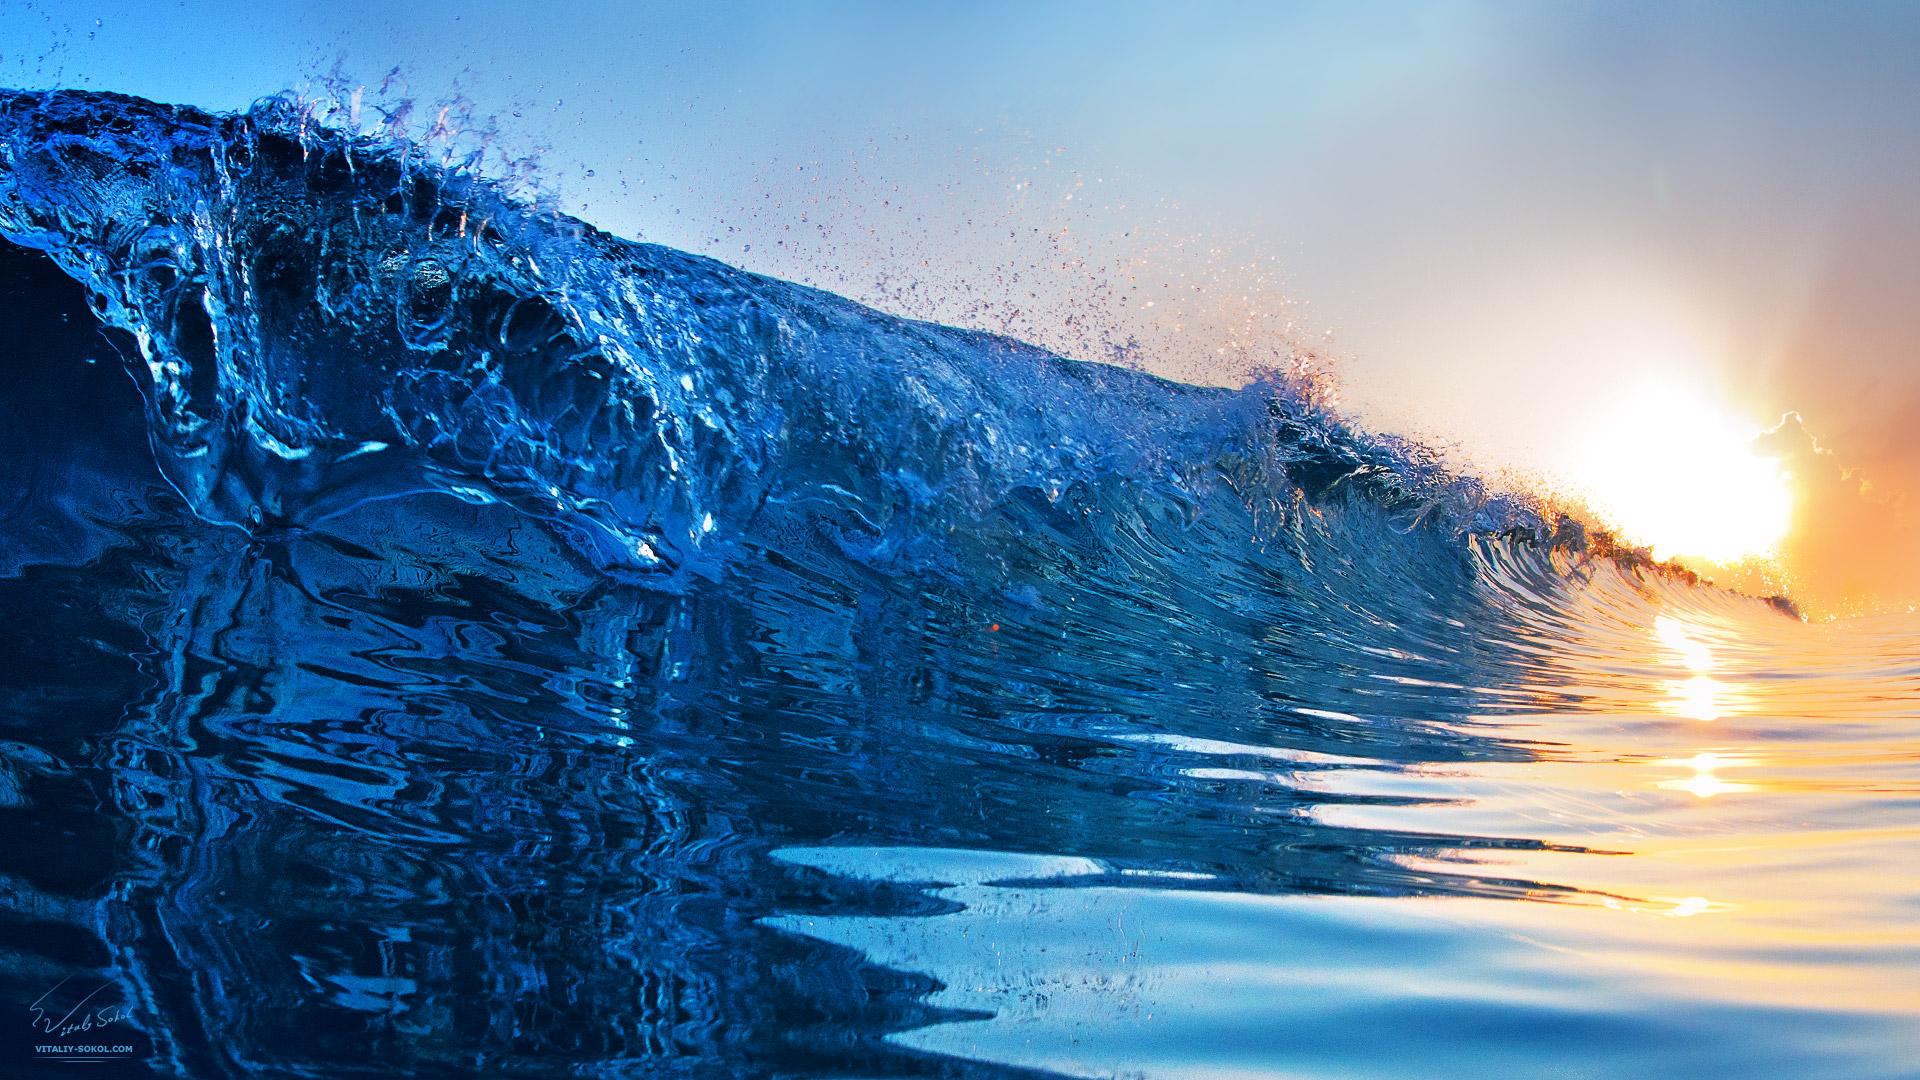 http://www.shutterstock.com/sets/120403-waves.html?rid=324673